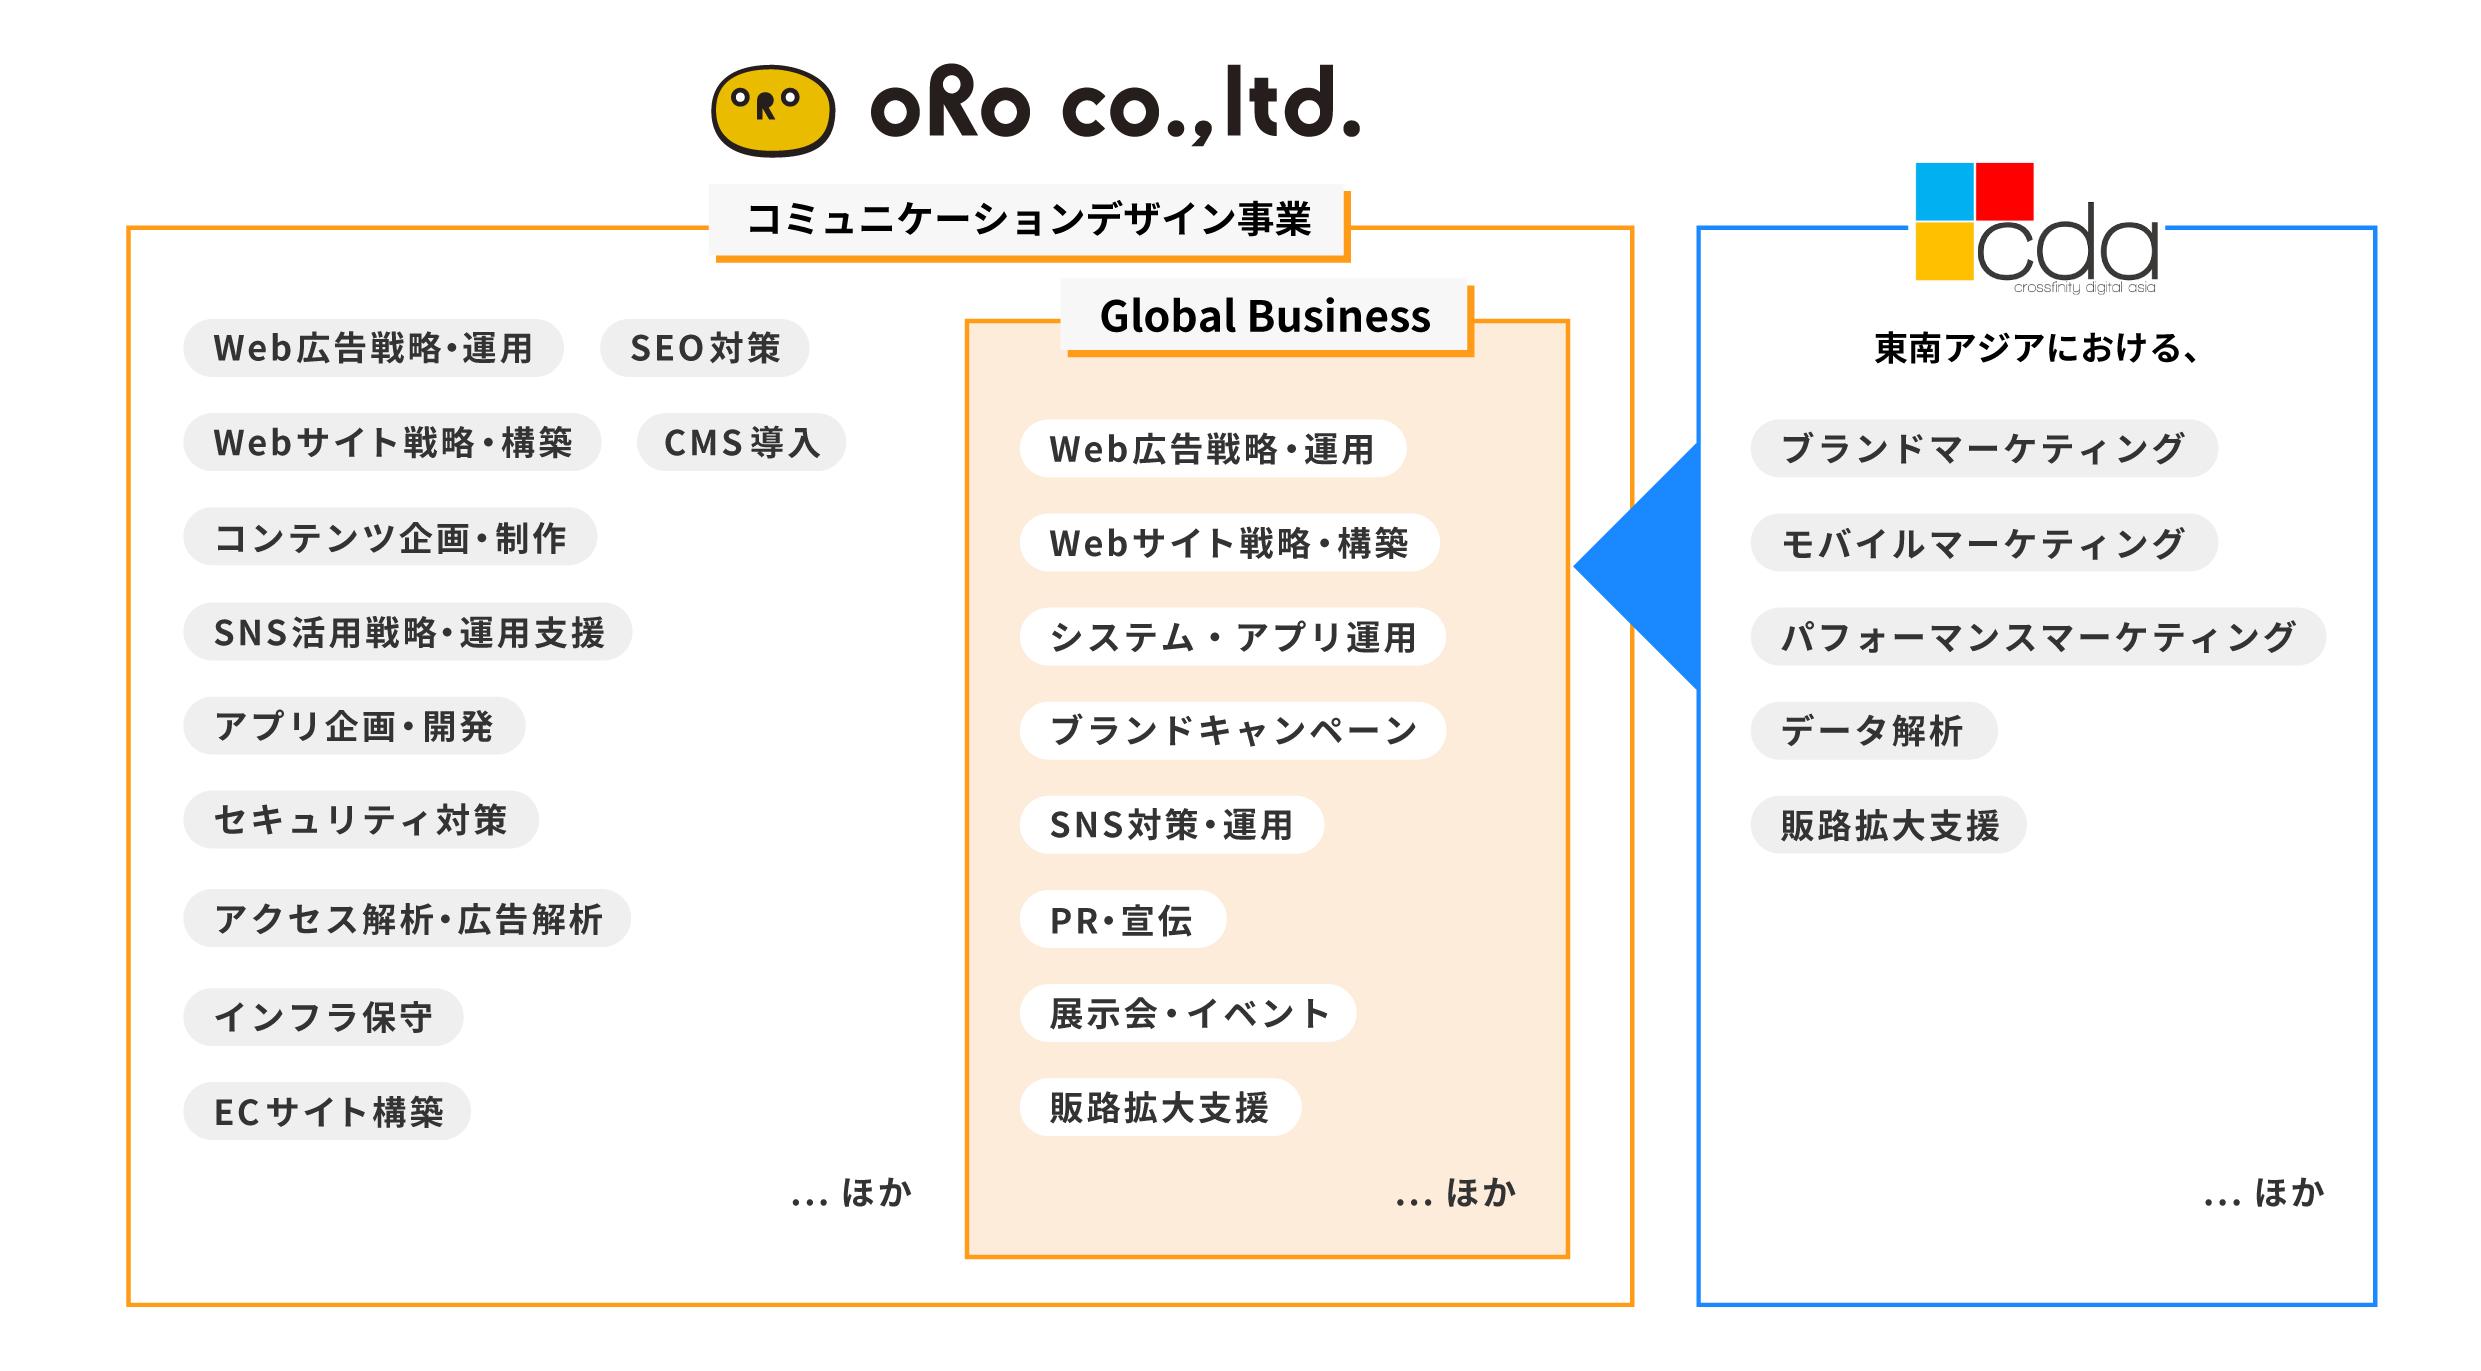 https://www.oro.com/img_2_rev02.png